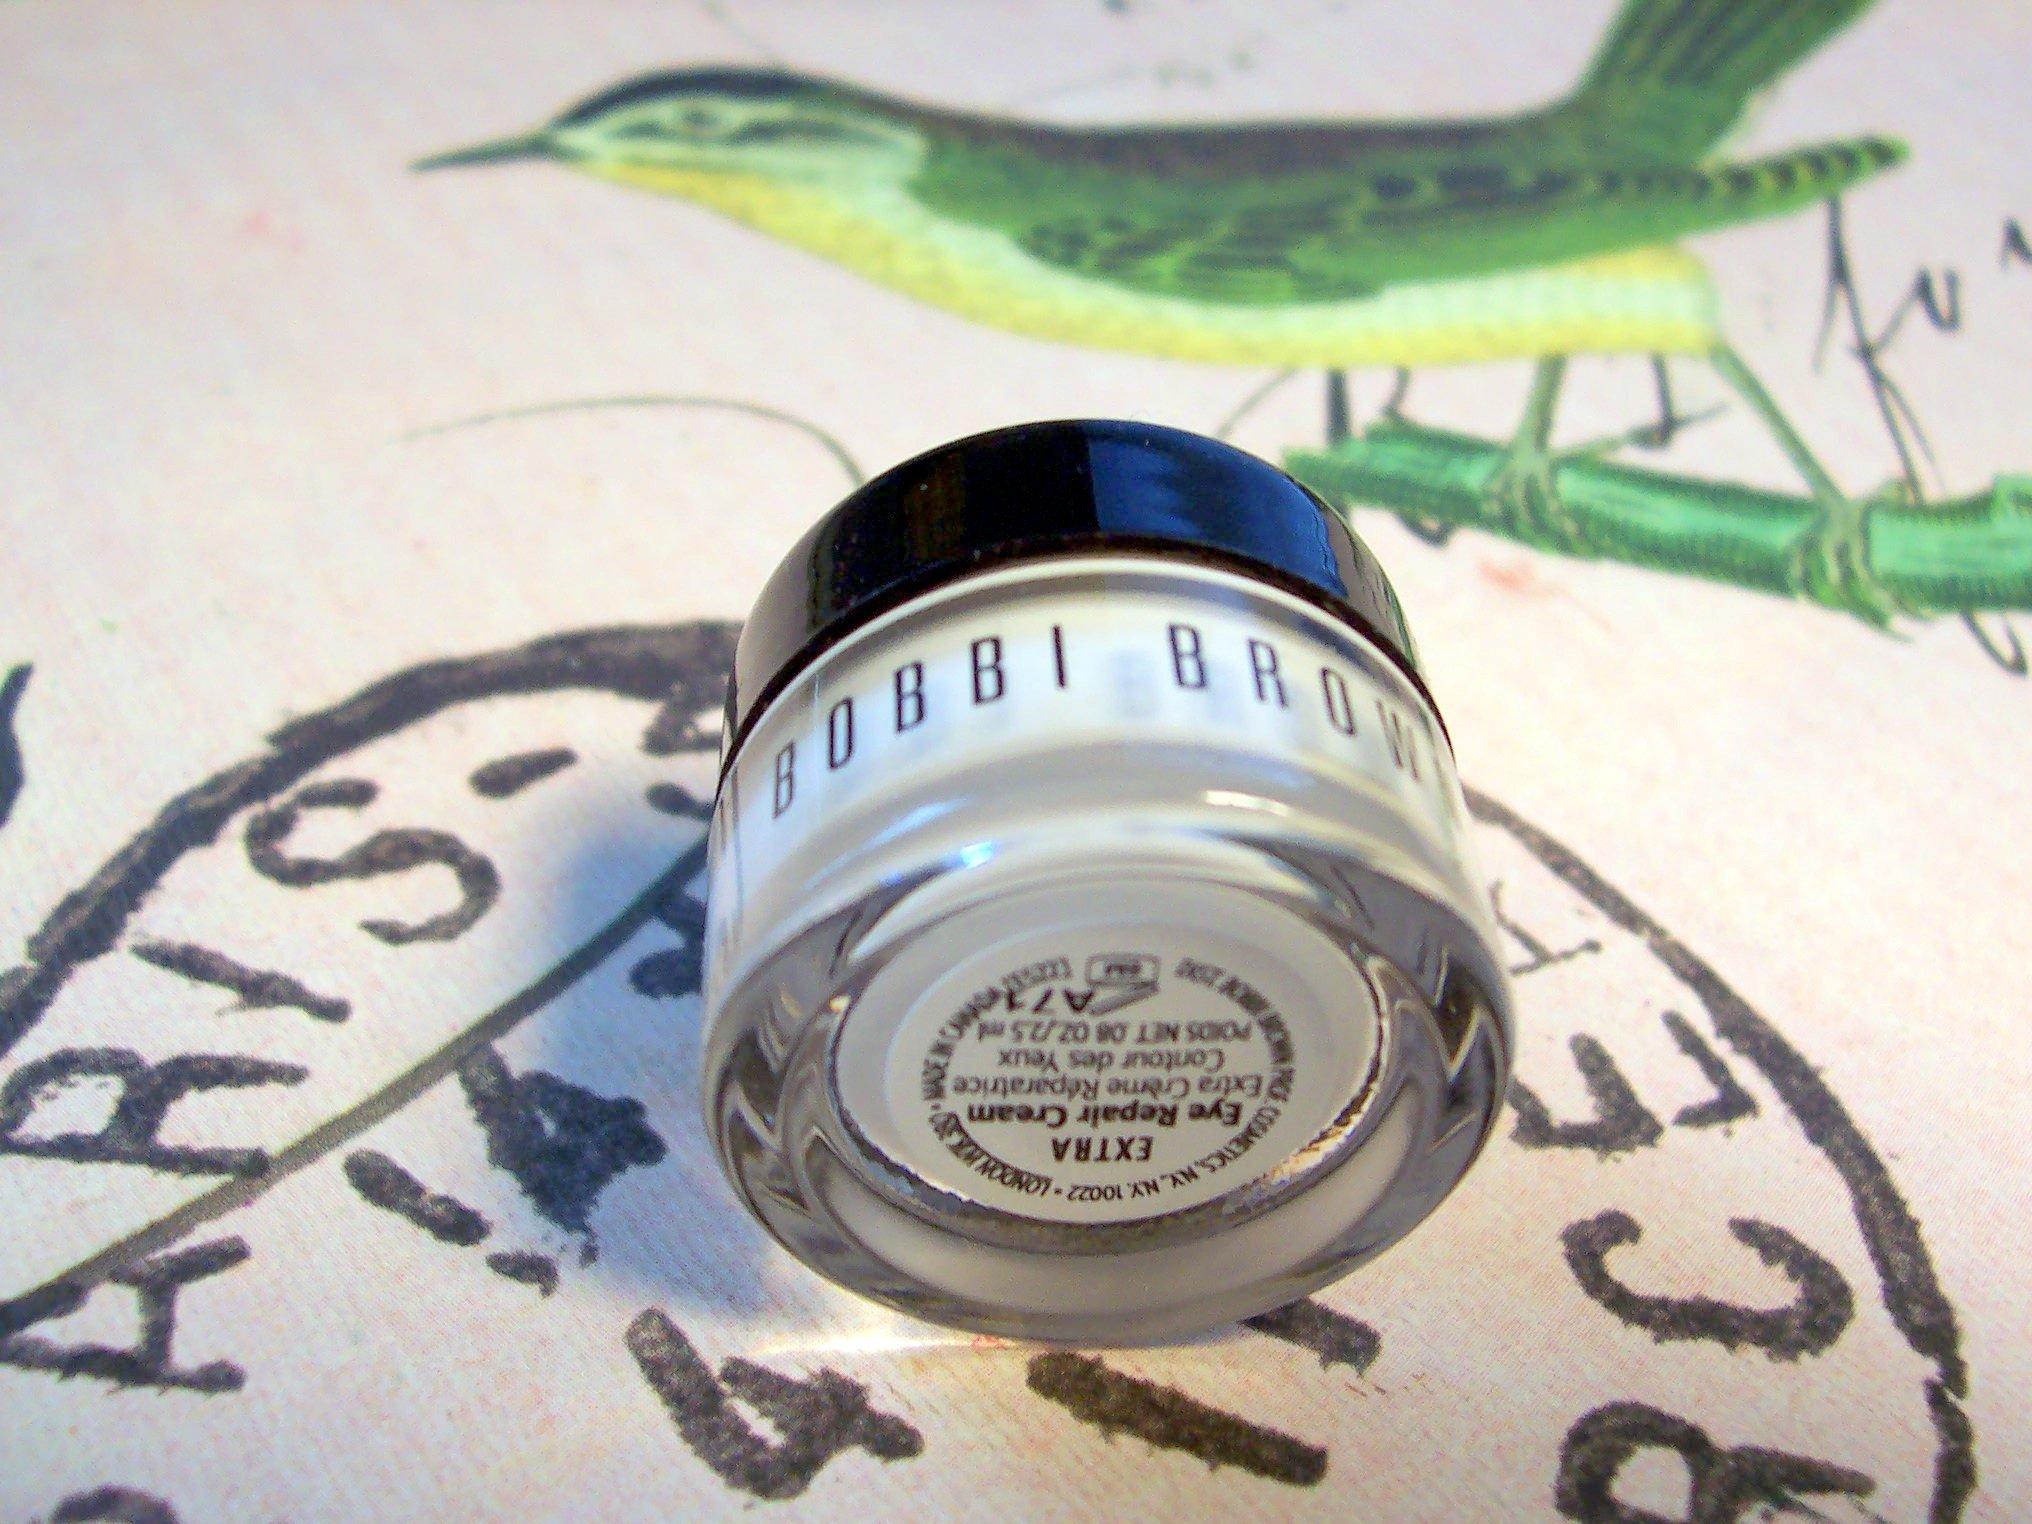 Bobbi brown extra eye repair cream travel size 0.08 oz/ 2.5 ml